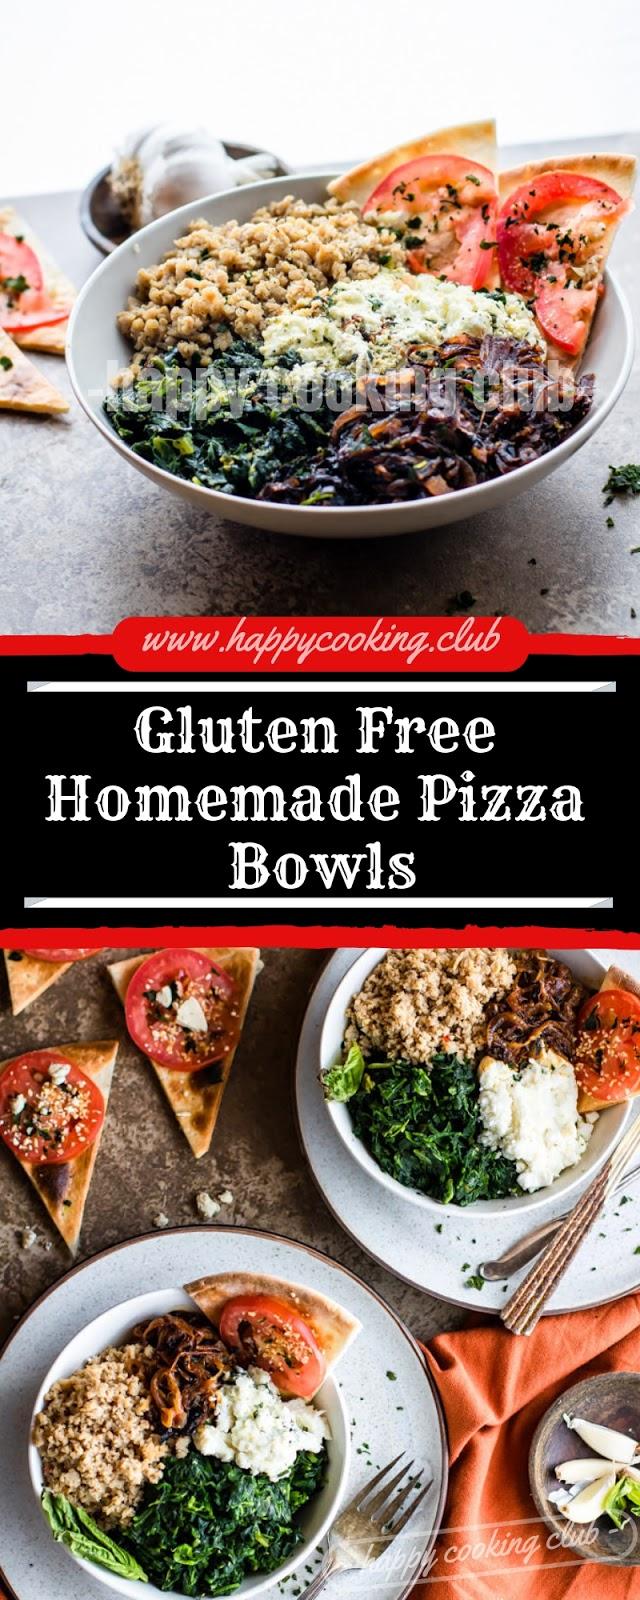 Gluten Free Homemade Pizza Bowls